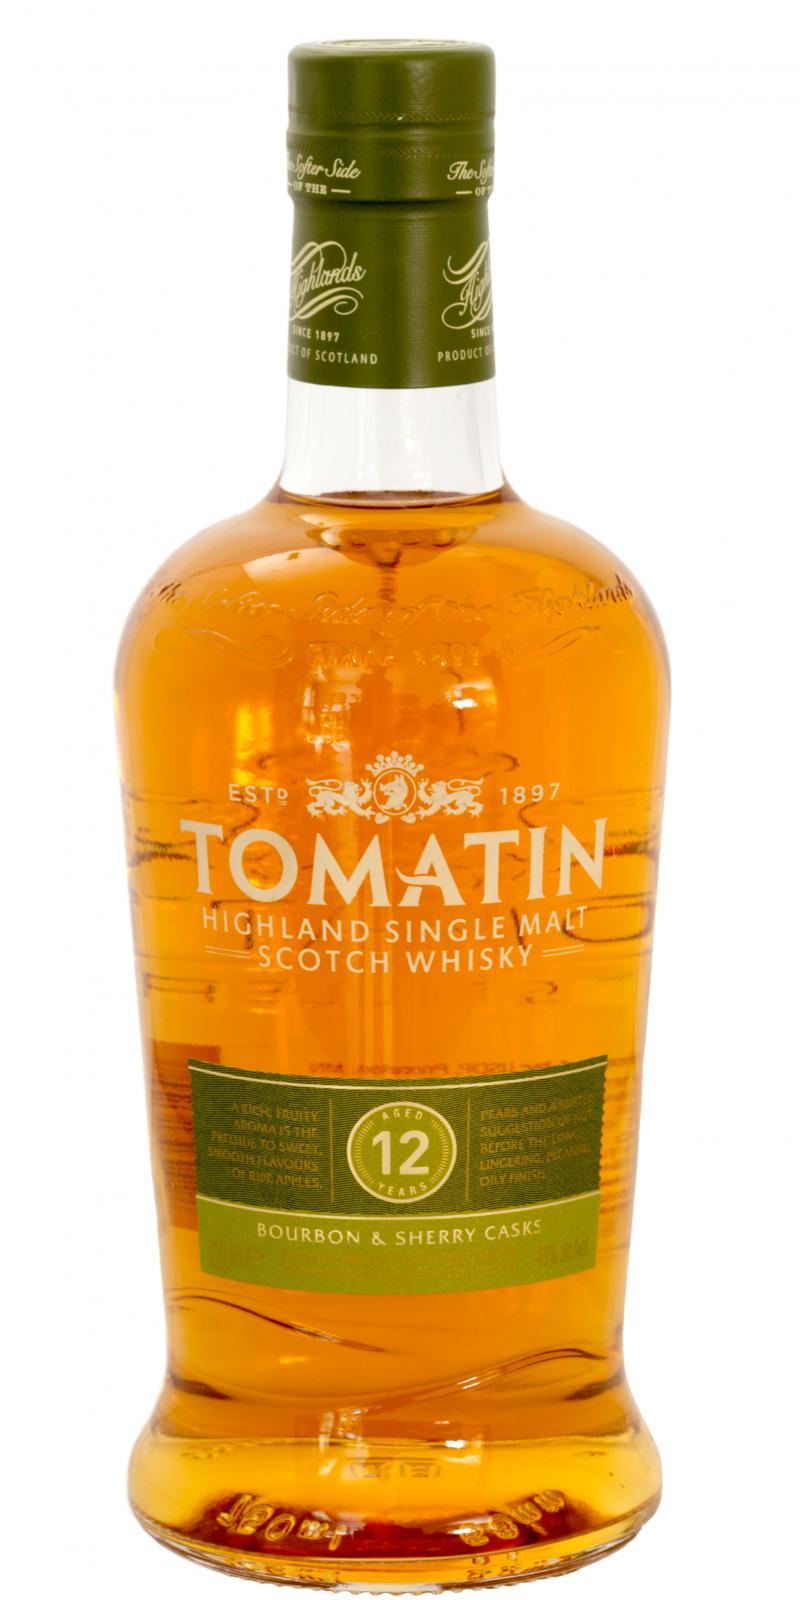 Tomatin 12-year-old